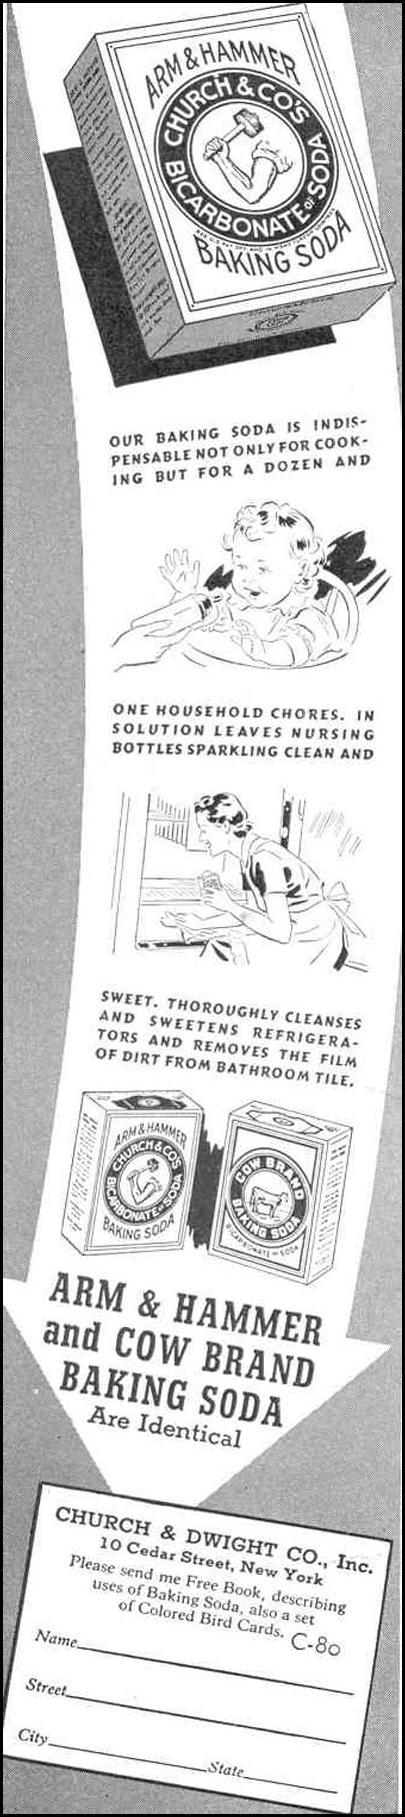 ARM & HAMMER BAKING SODA GOOD HOUSEKEEPING 03/01/1940 p. 184